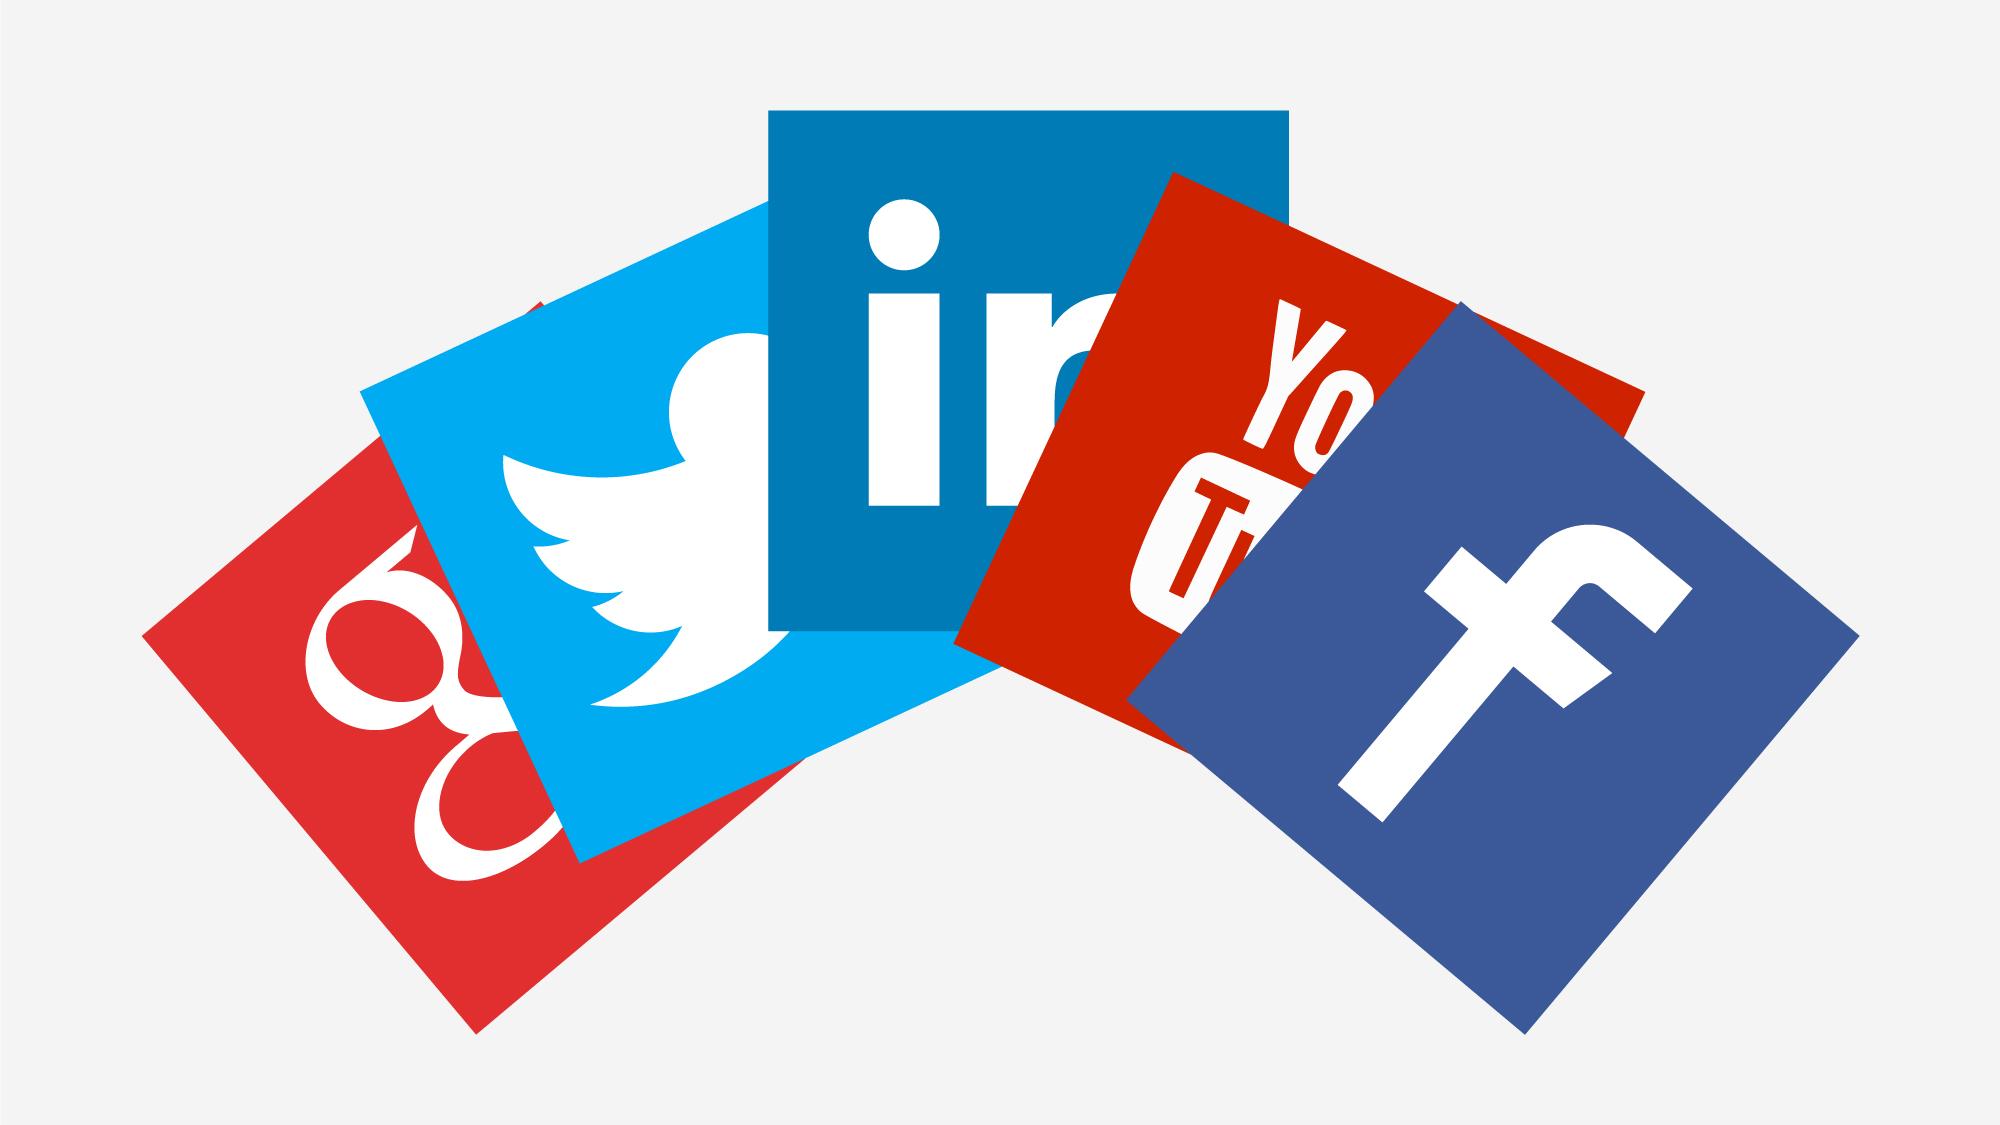 Share a paper on social media -